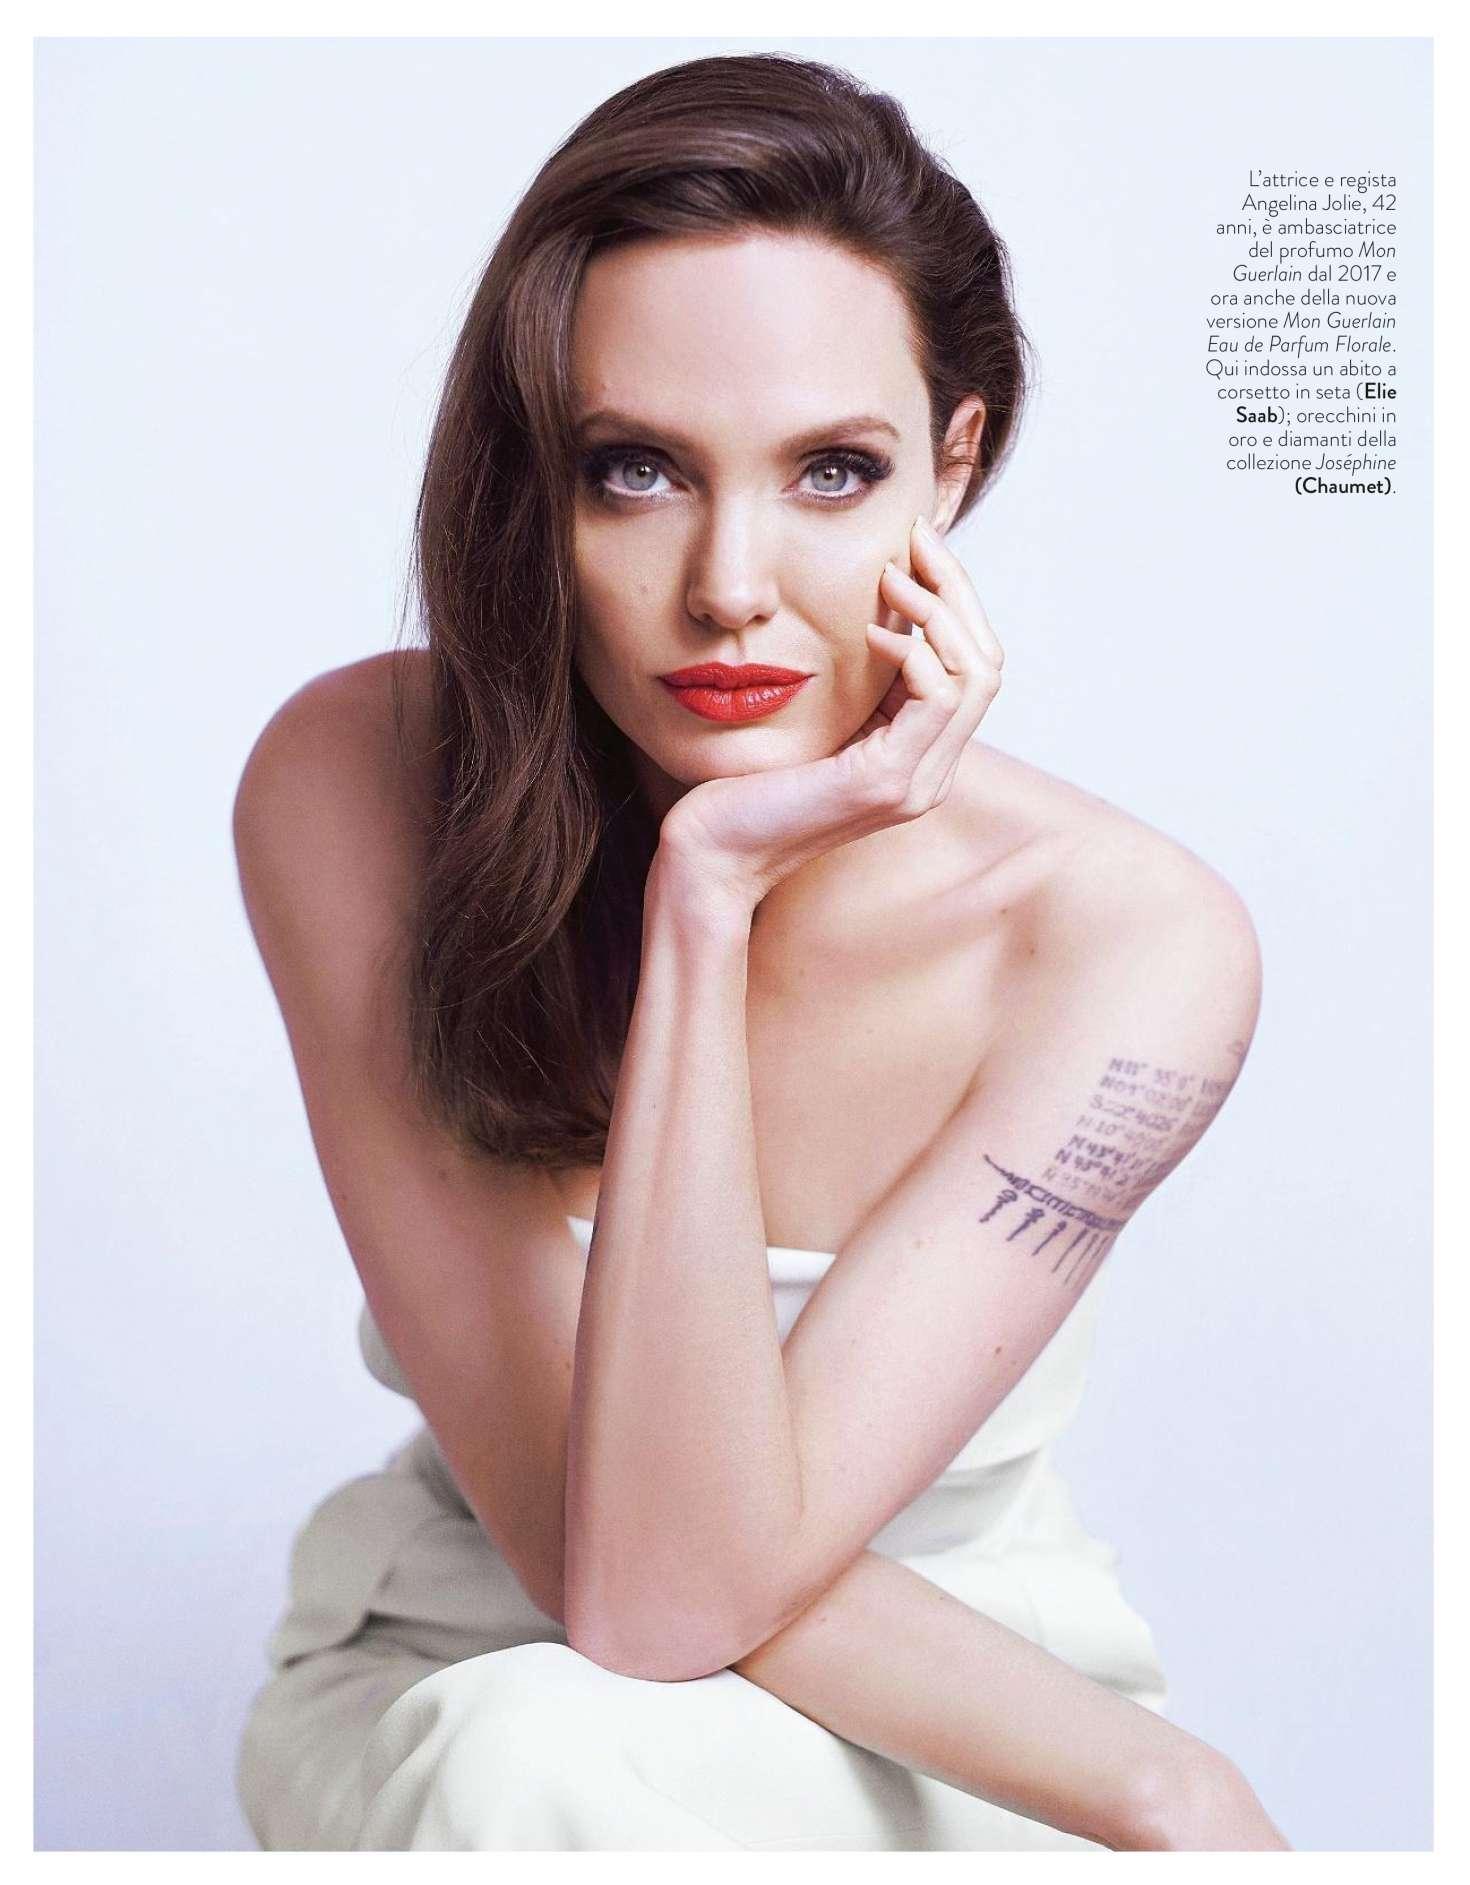 Lindsay lohan new york mag photos Breaking Celeb News, Entertainment News, and Celebrity